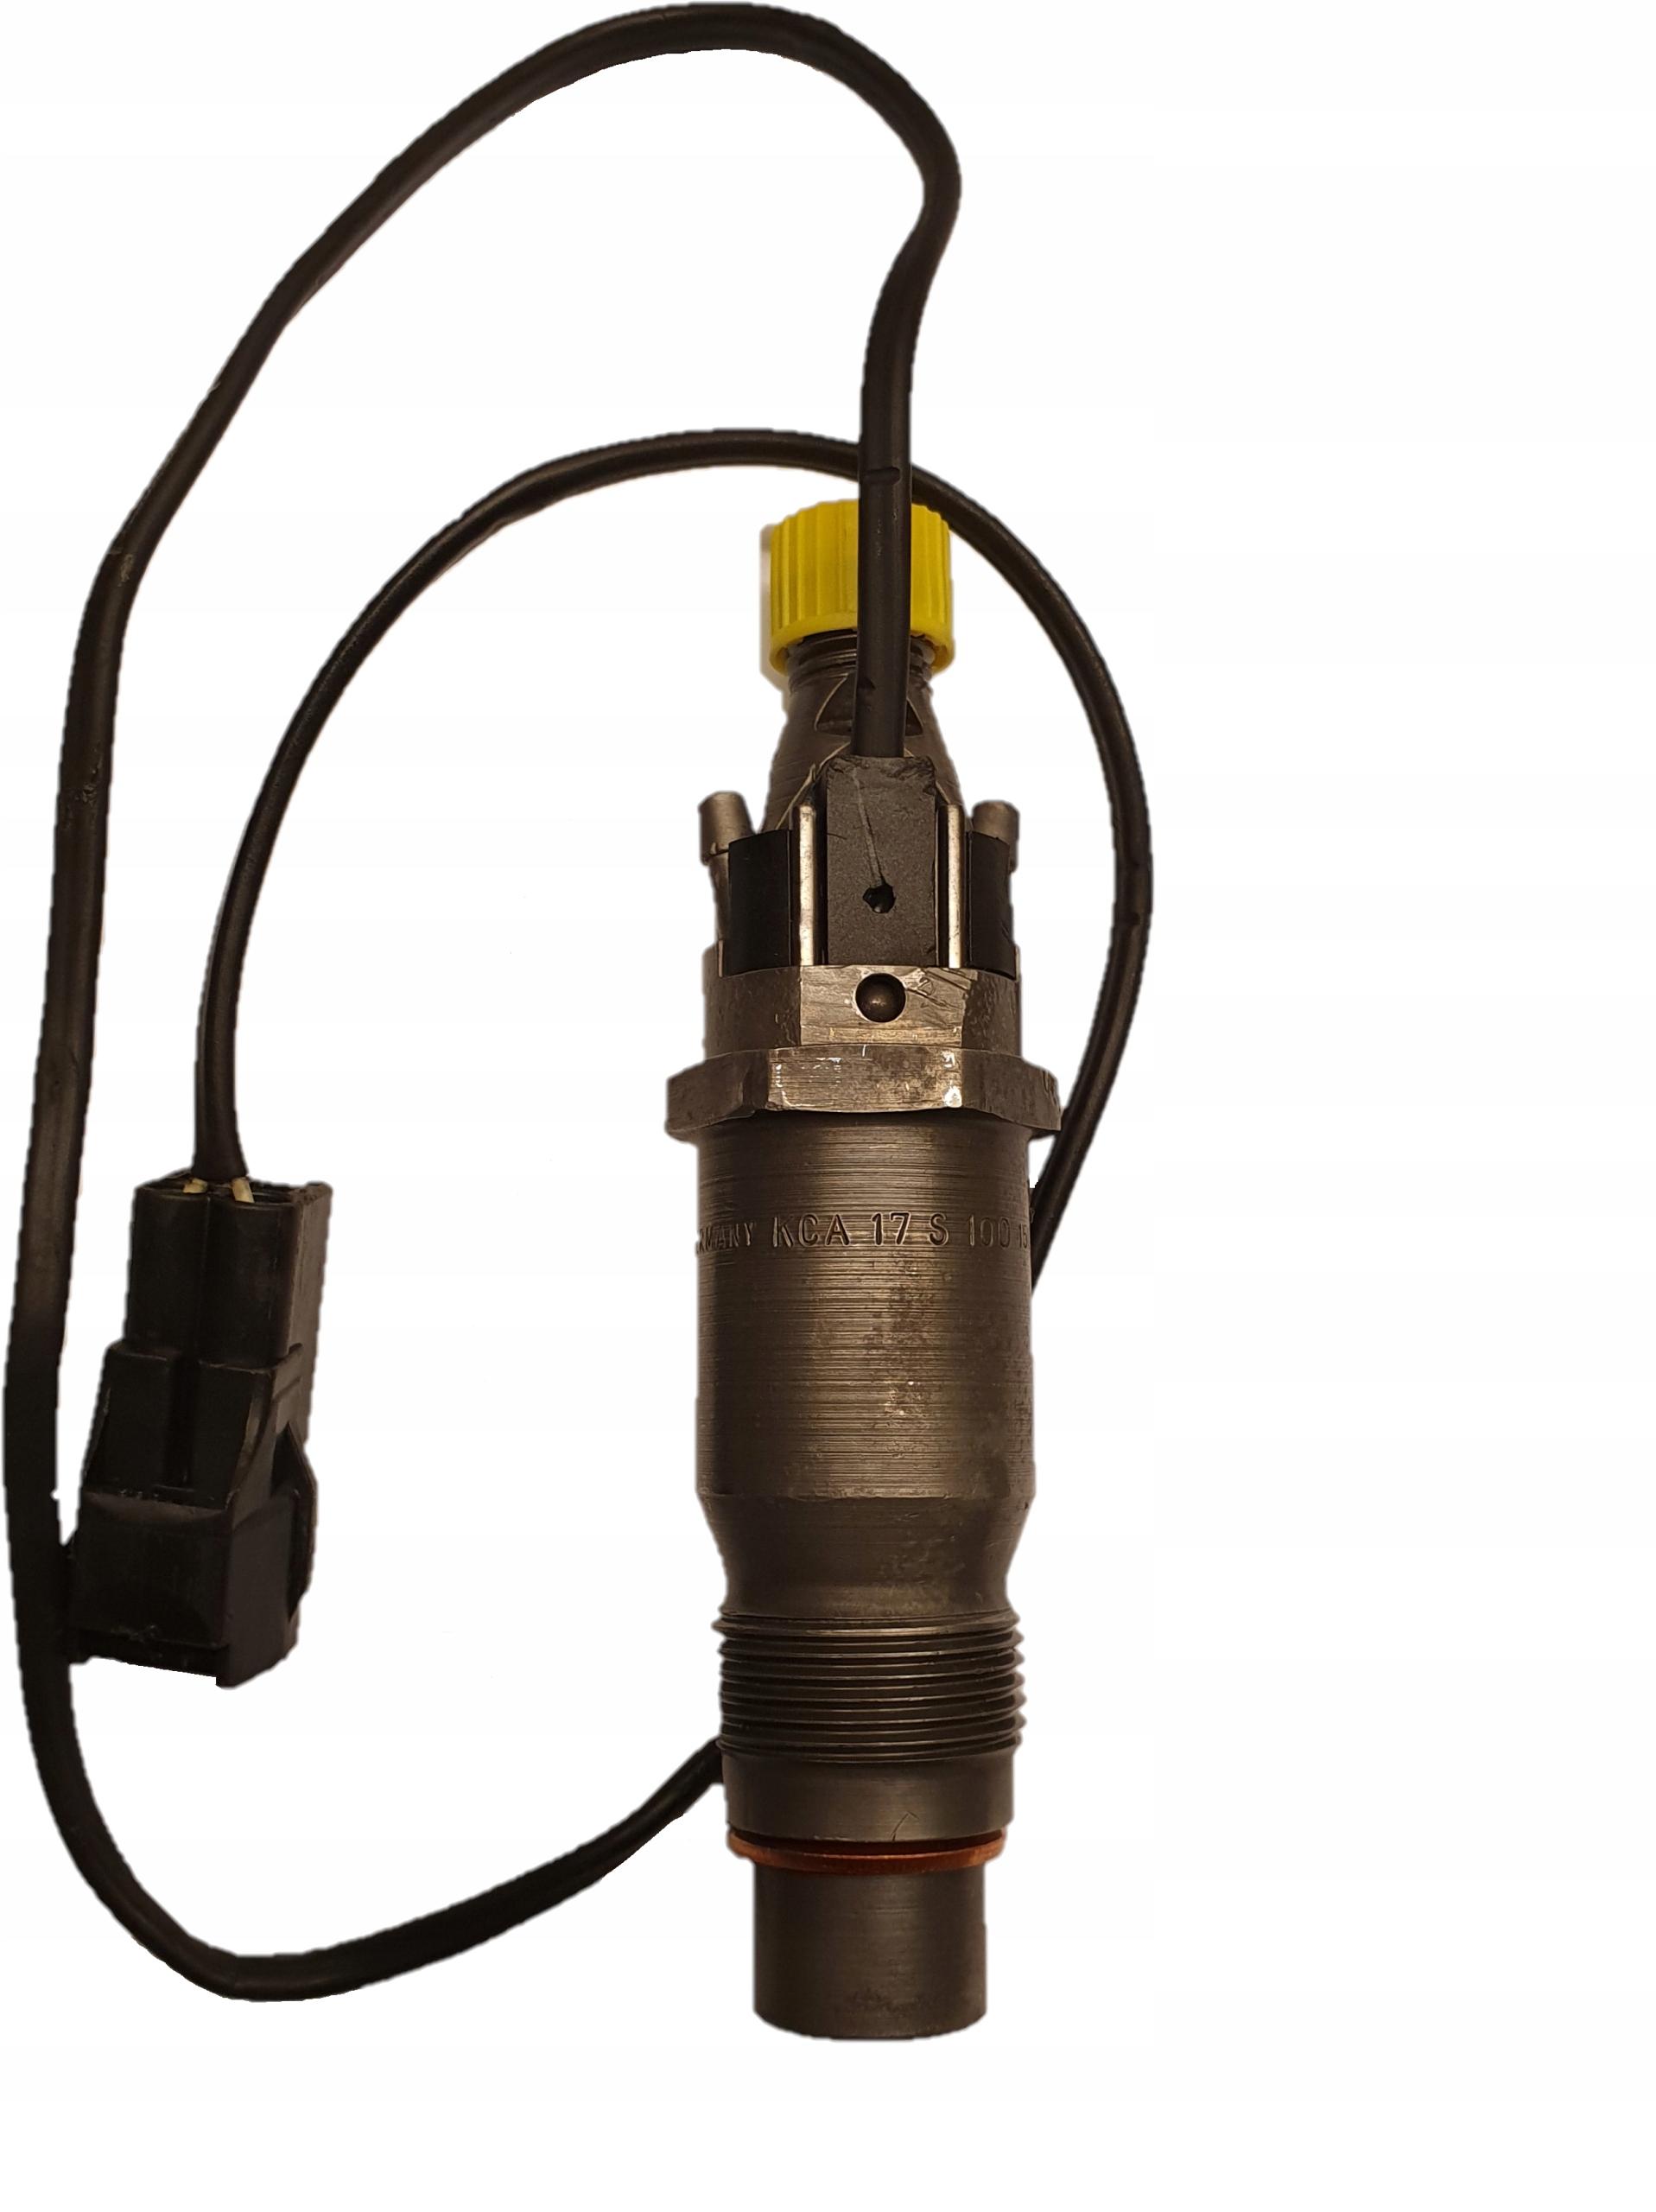 инжектор управляющий впрыск джип grand cherokee